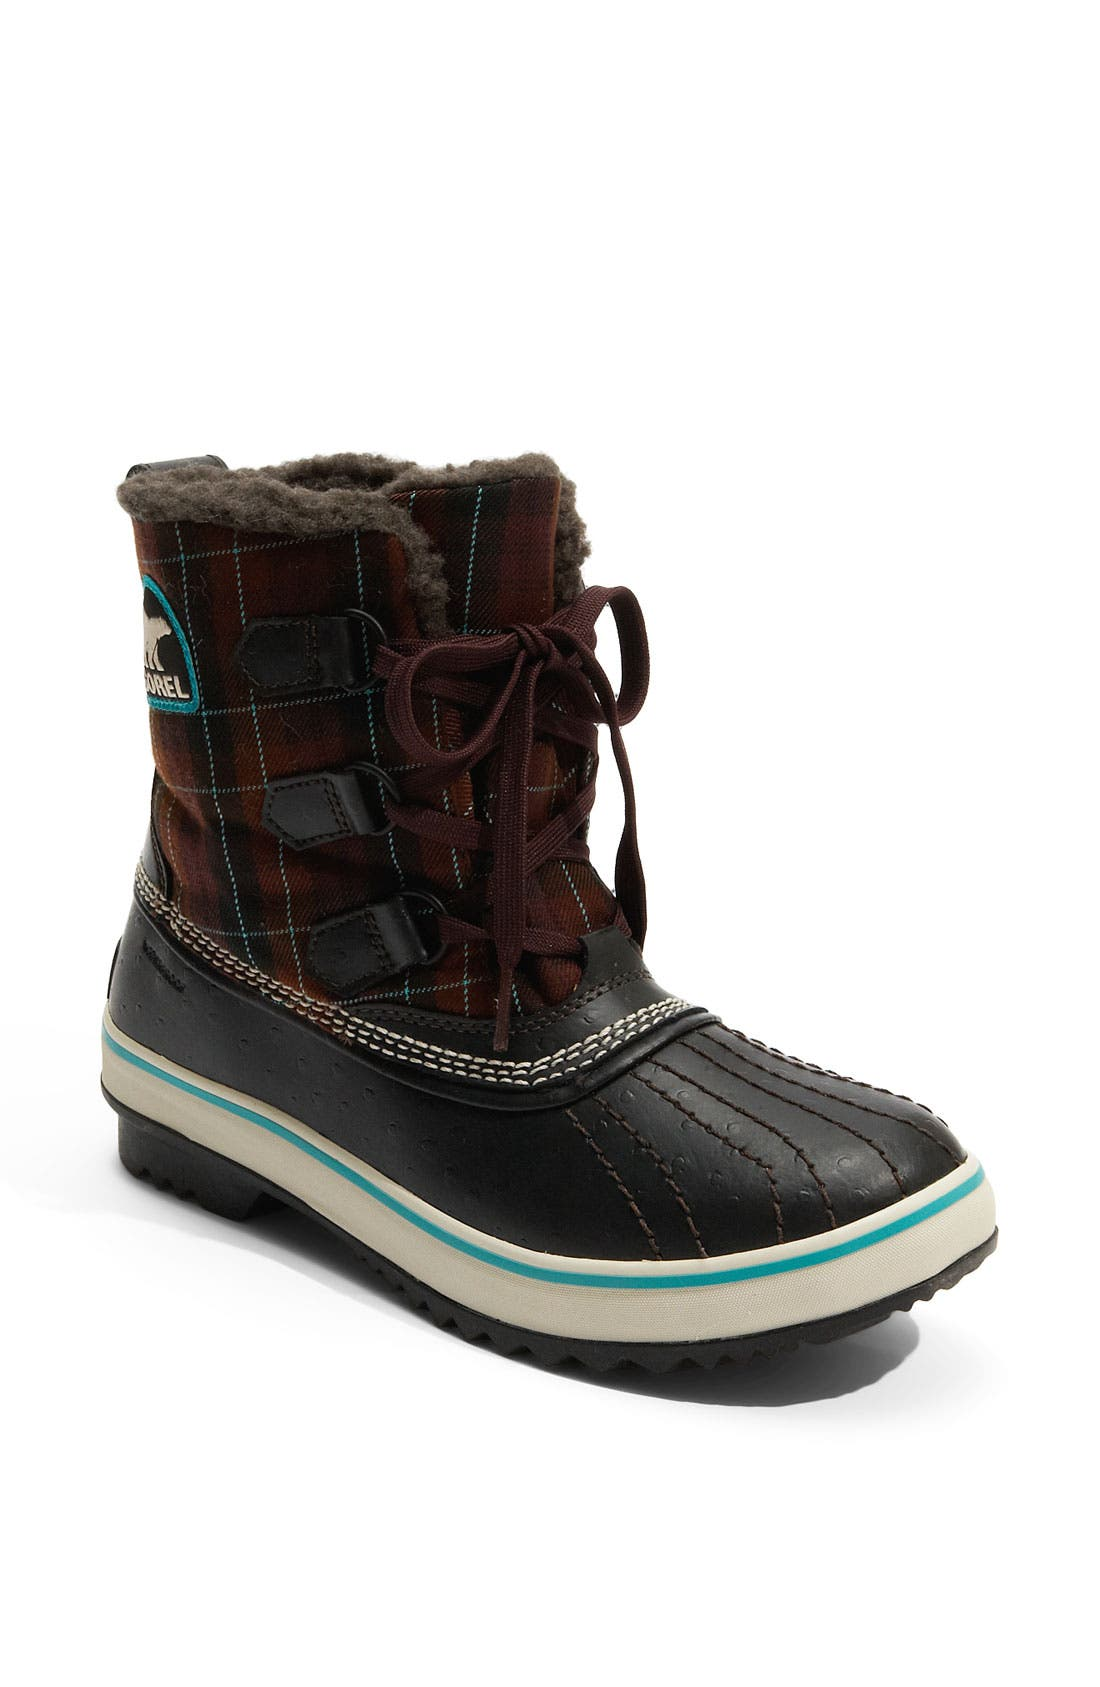 Main Image - SOREL 'Tivoli' Waterproof Boot